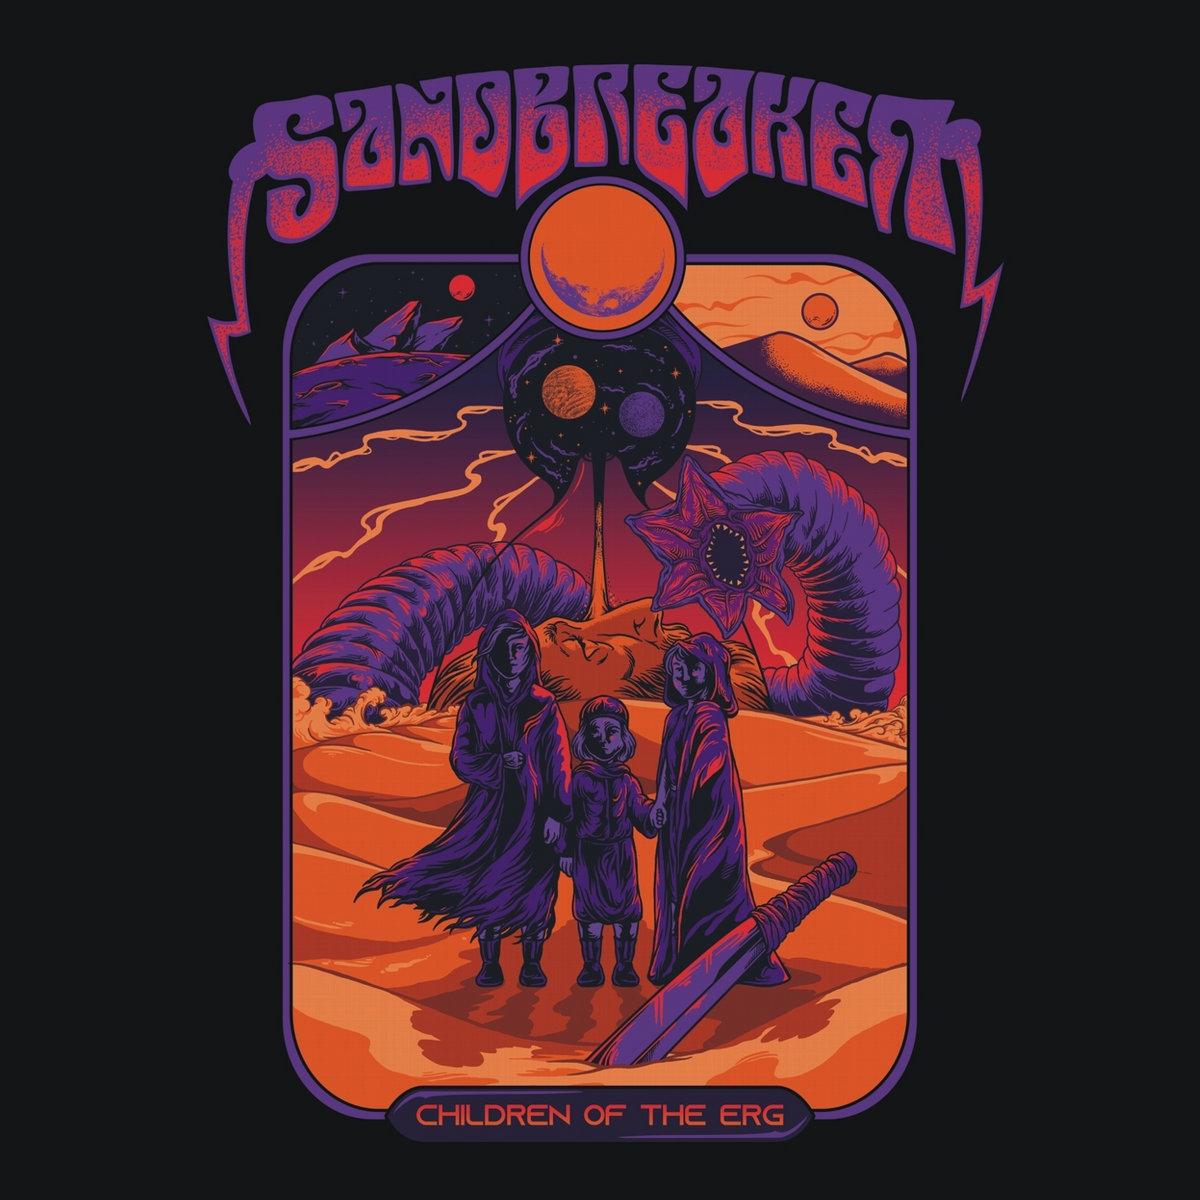 Sandbreaker - Children of the Erg (2021) [FLAC] Download